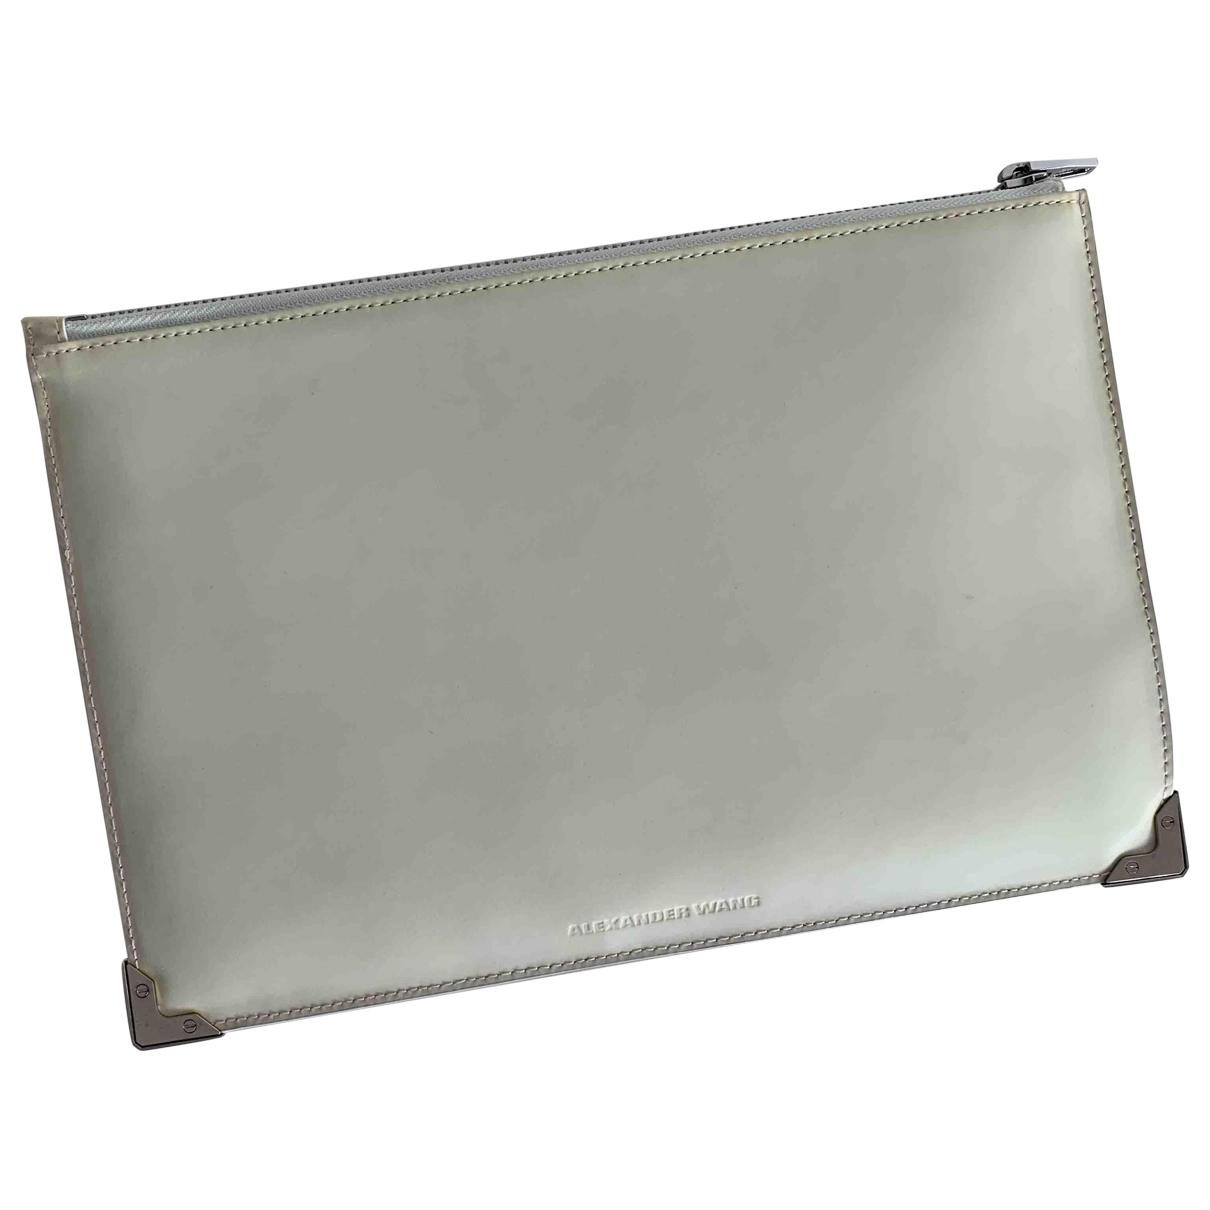 Alexander Wang \N White Leather Clutch bag for Women \N